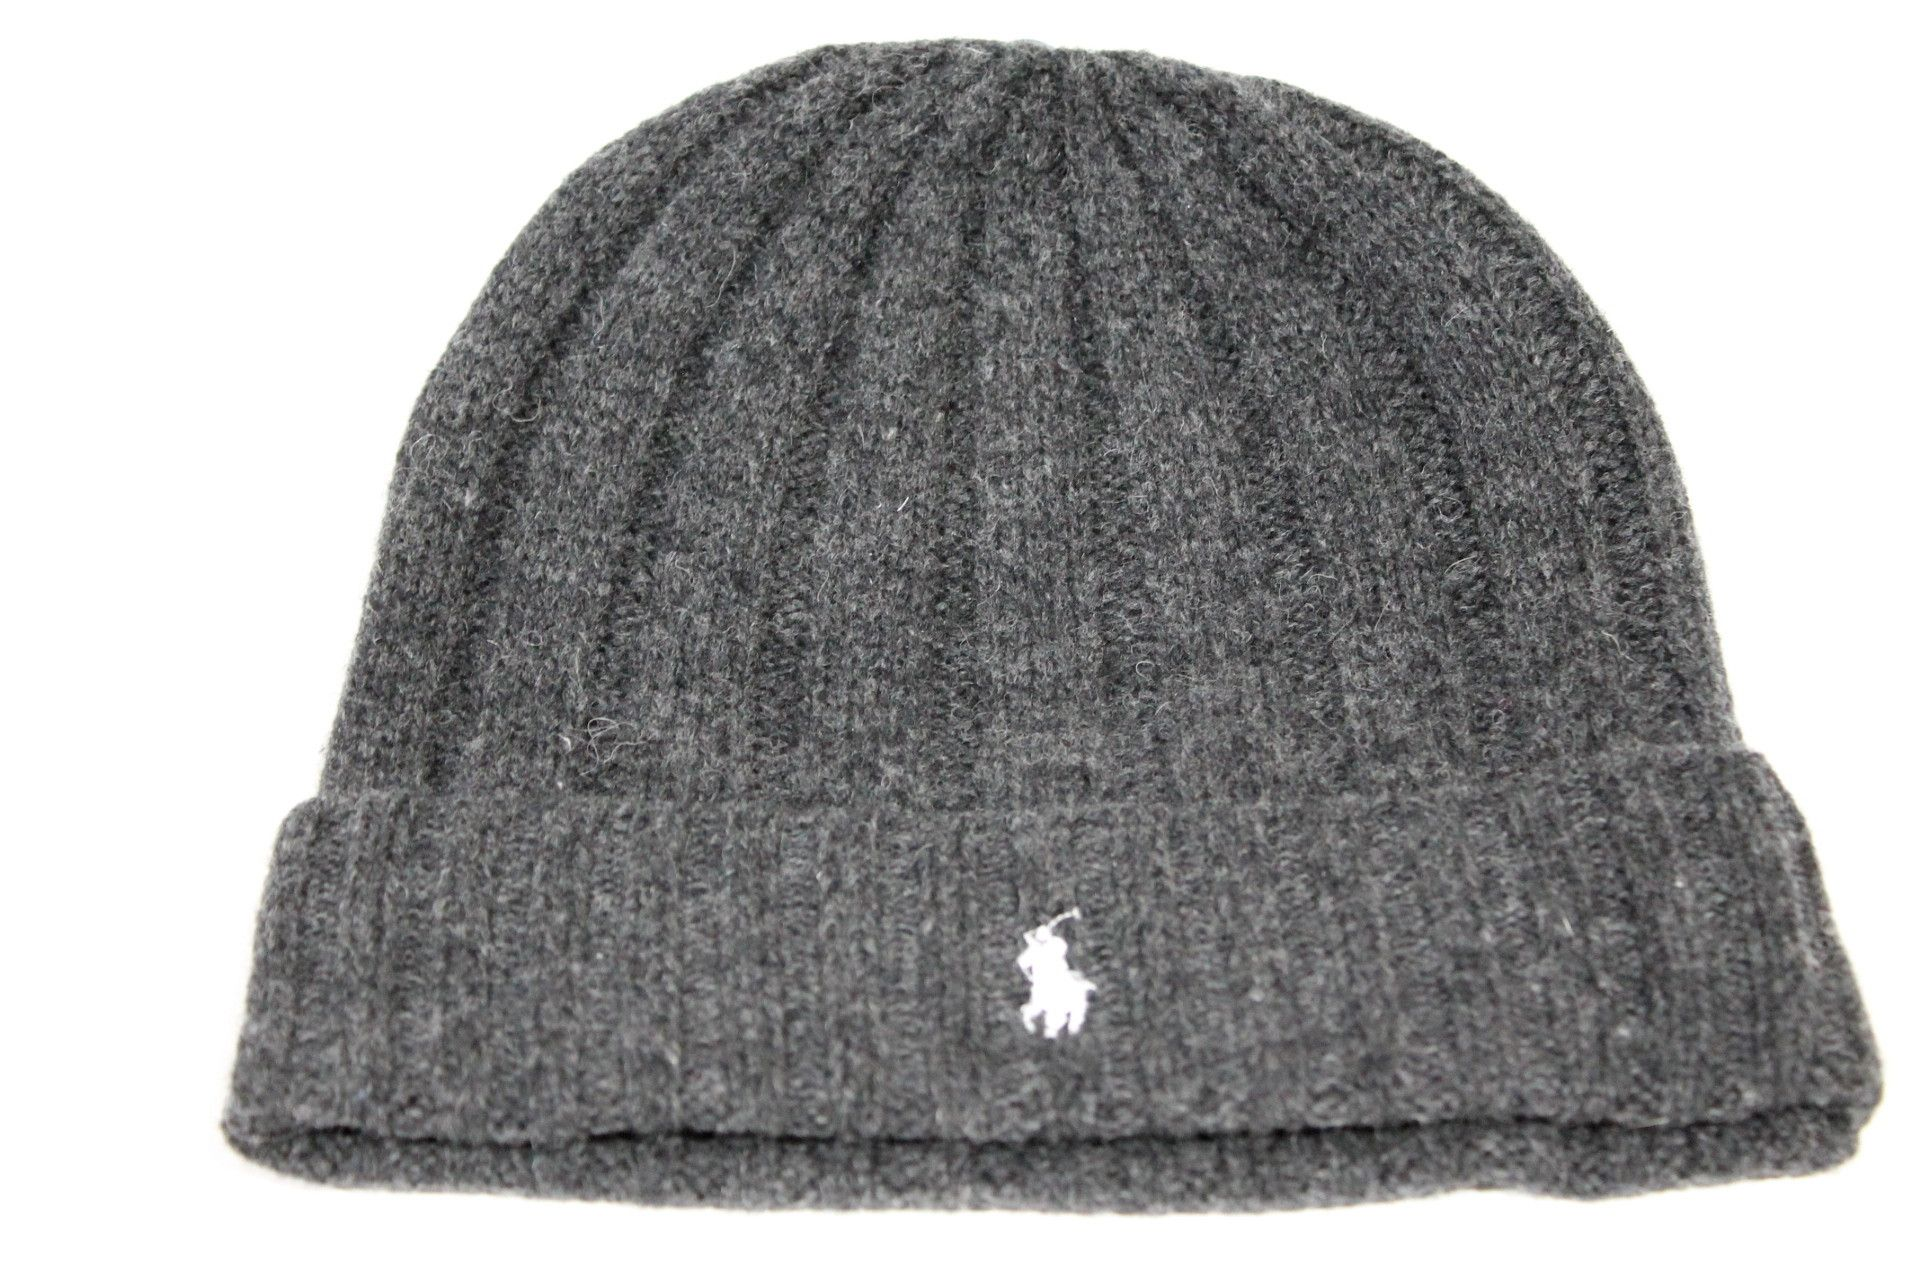 Polo Ralph Lauren Mens Lambs Wool Charcoal/White Pony Beanie Hat OS   #winterglove #20%shoeco #northfacebeanie #20% #cleats #nikesoccer… #mercurialvictory #20%sho #shopsneakerkingdom #Women39;s